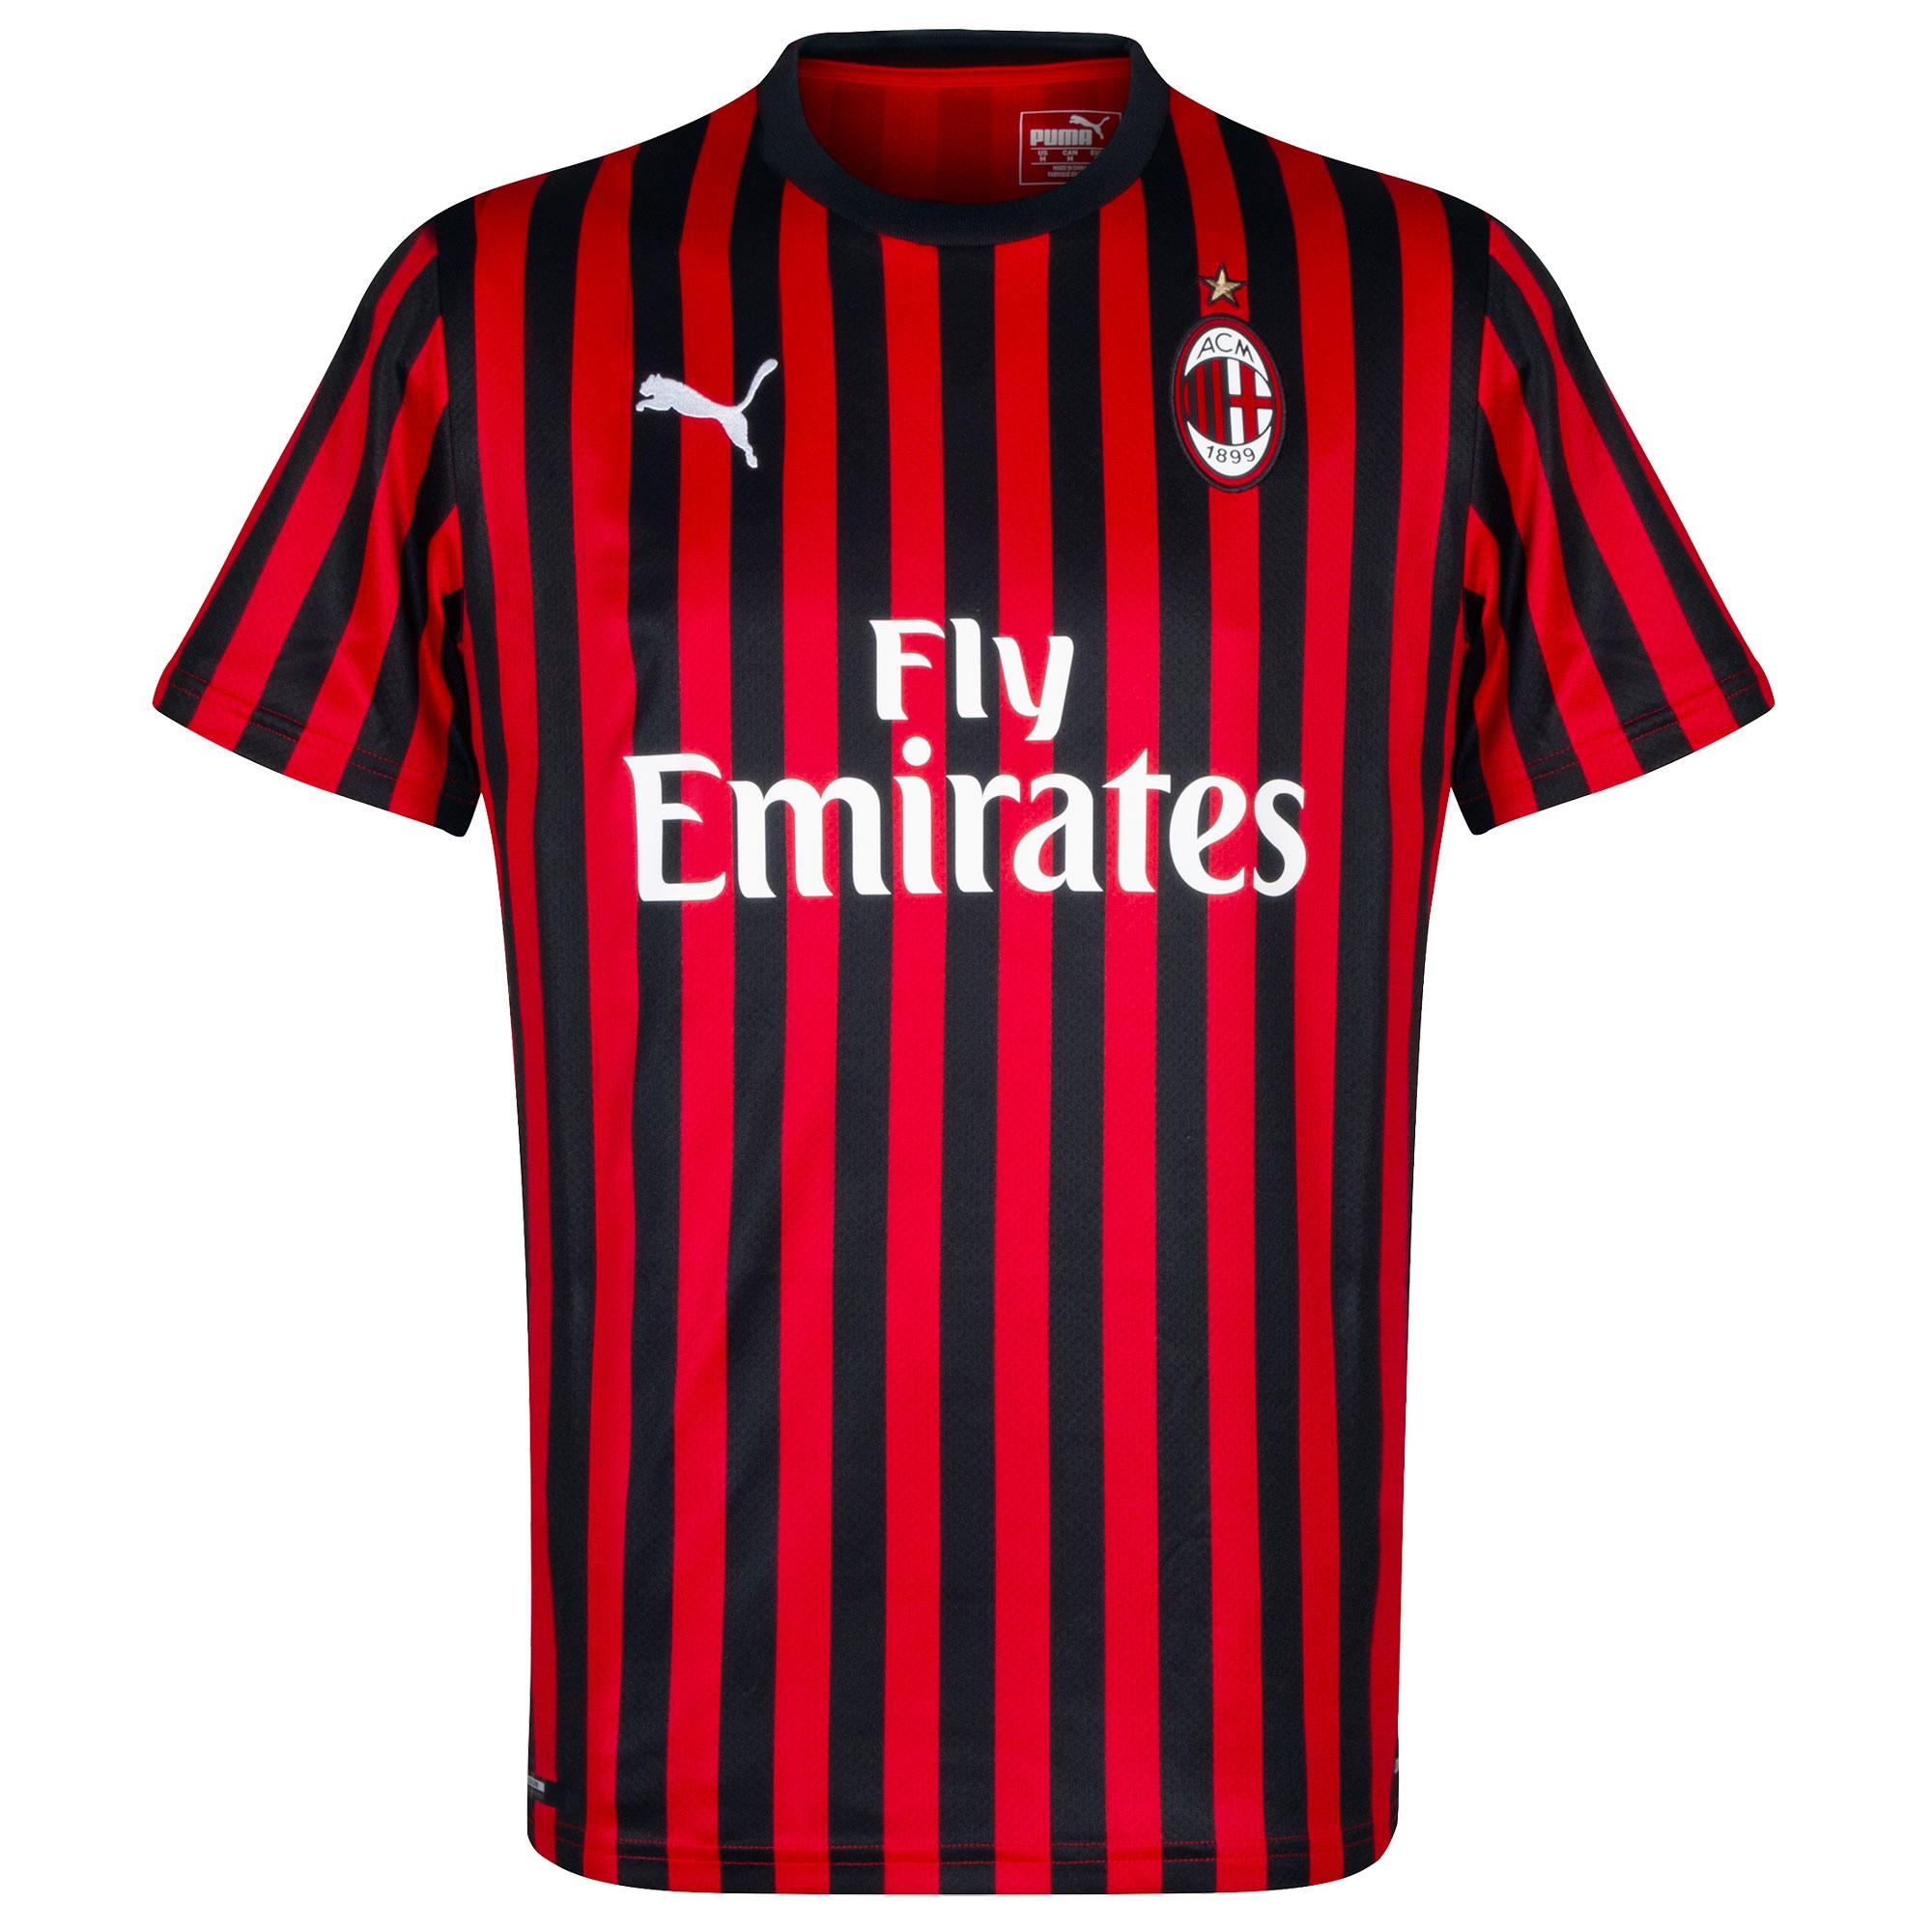 Puma AC Milan Home Shirt 2019-2020